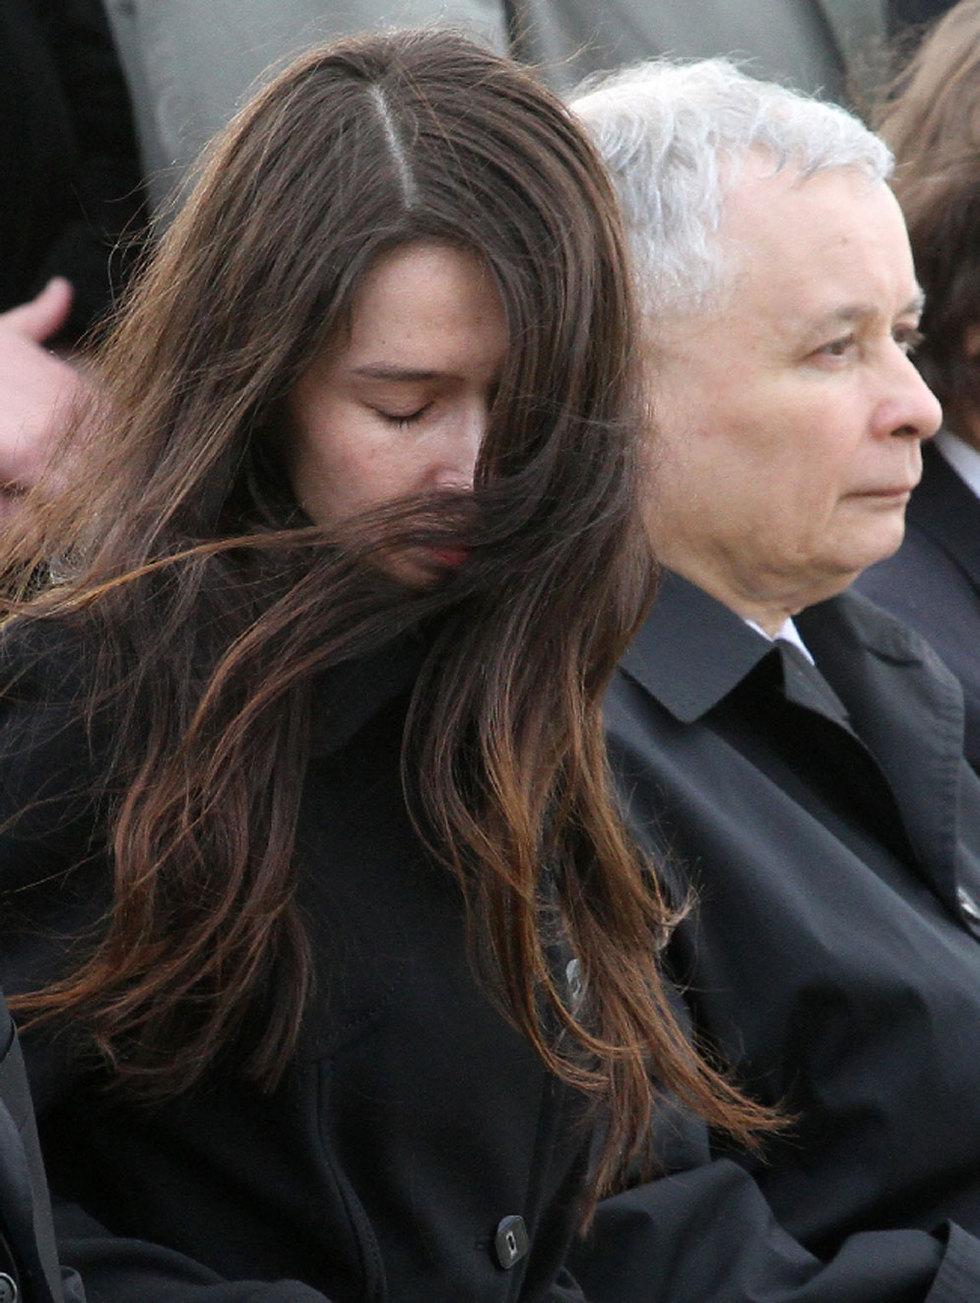 Polonia llora a Kaczynski  - El dolor de Marta